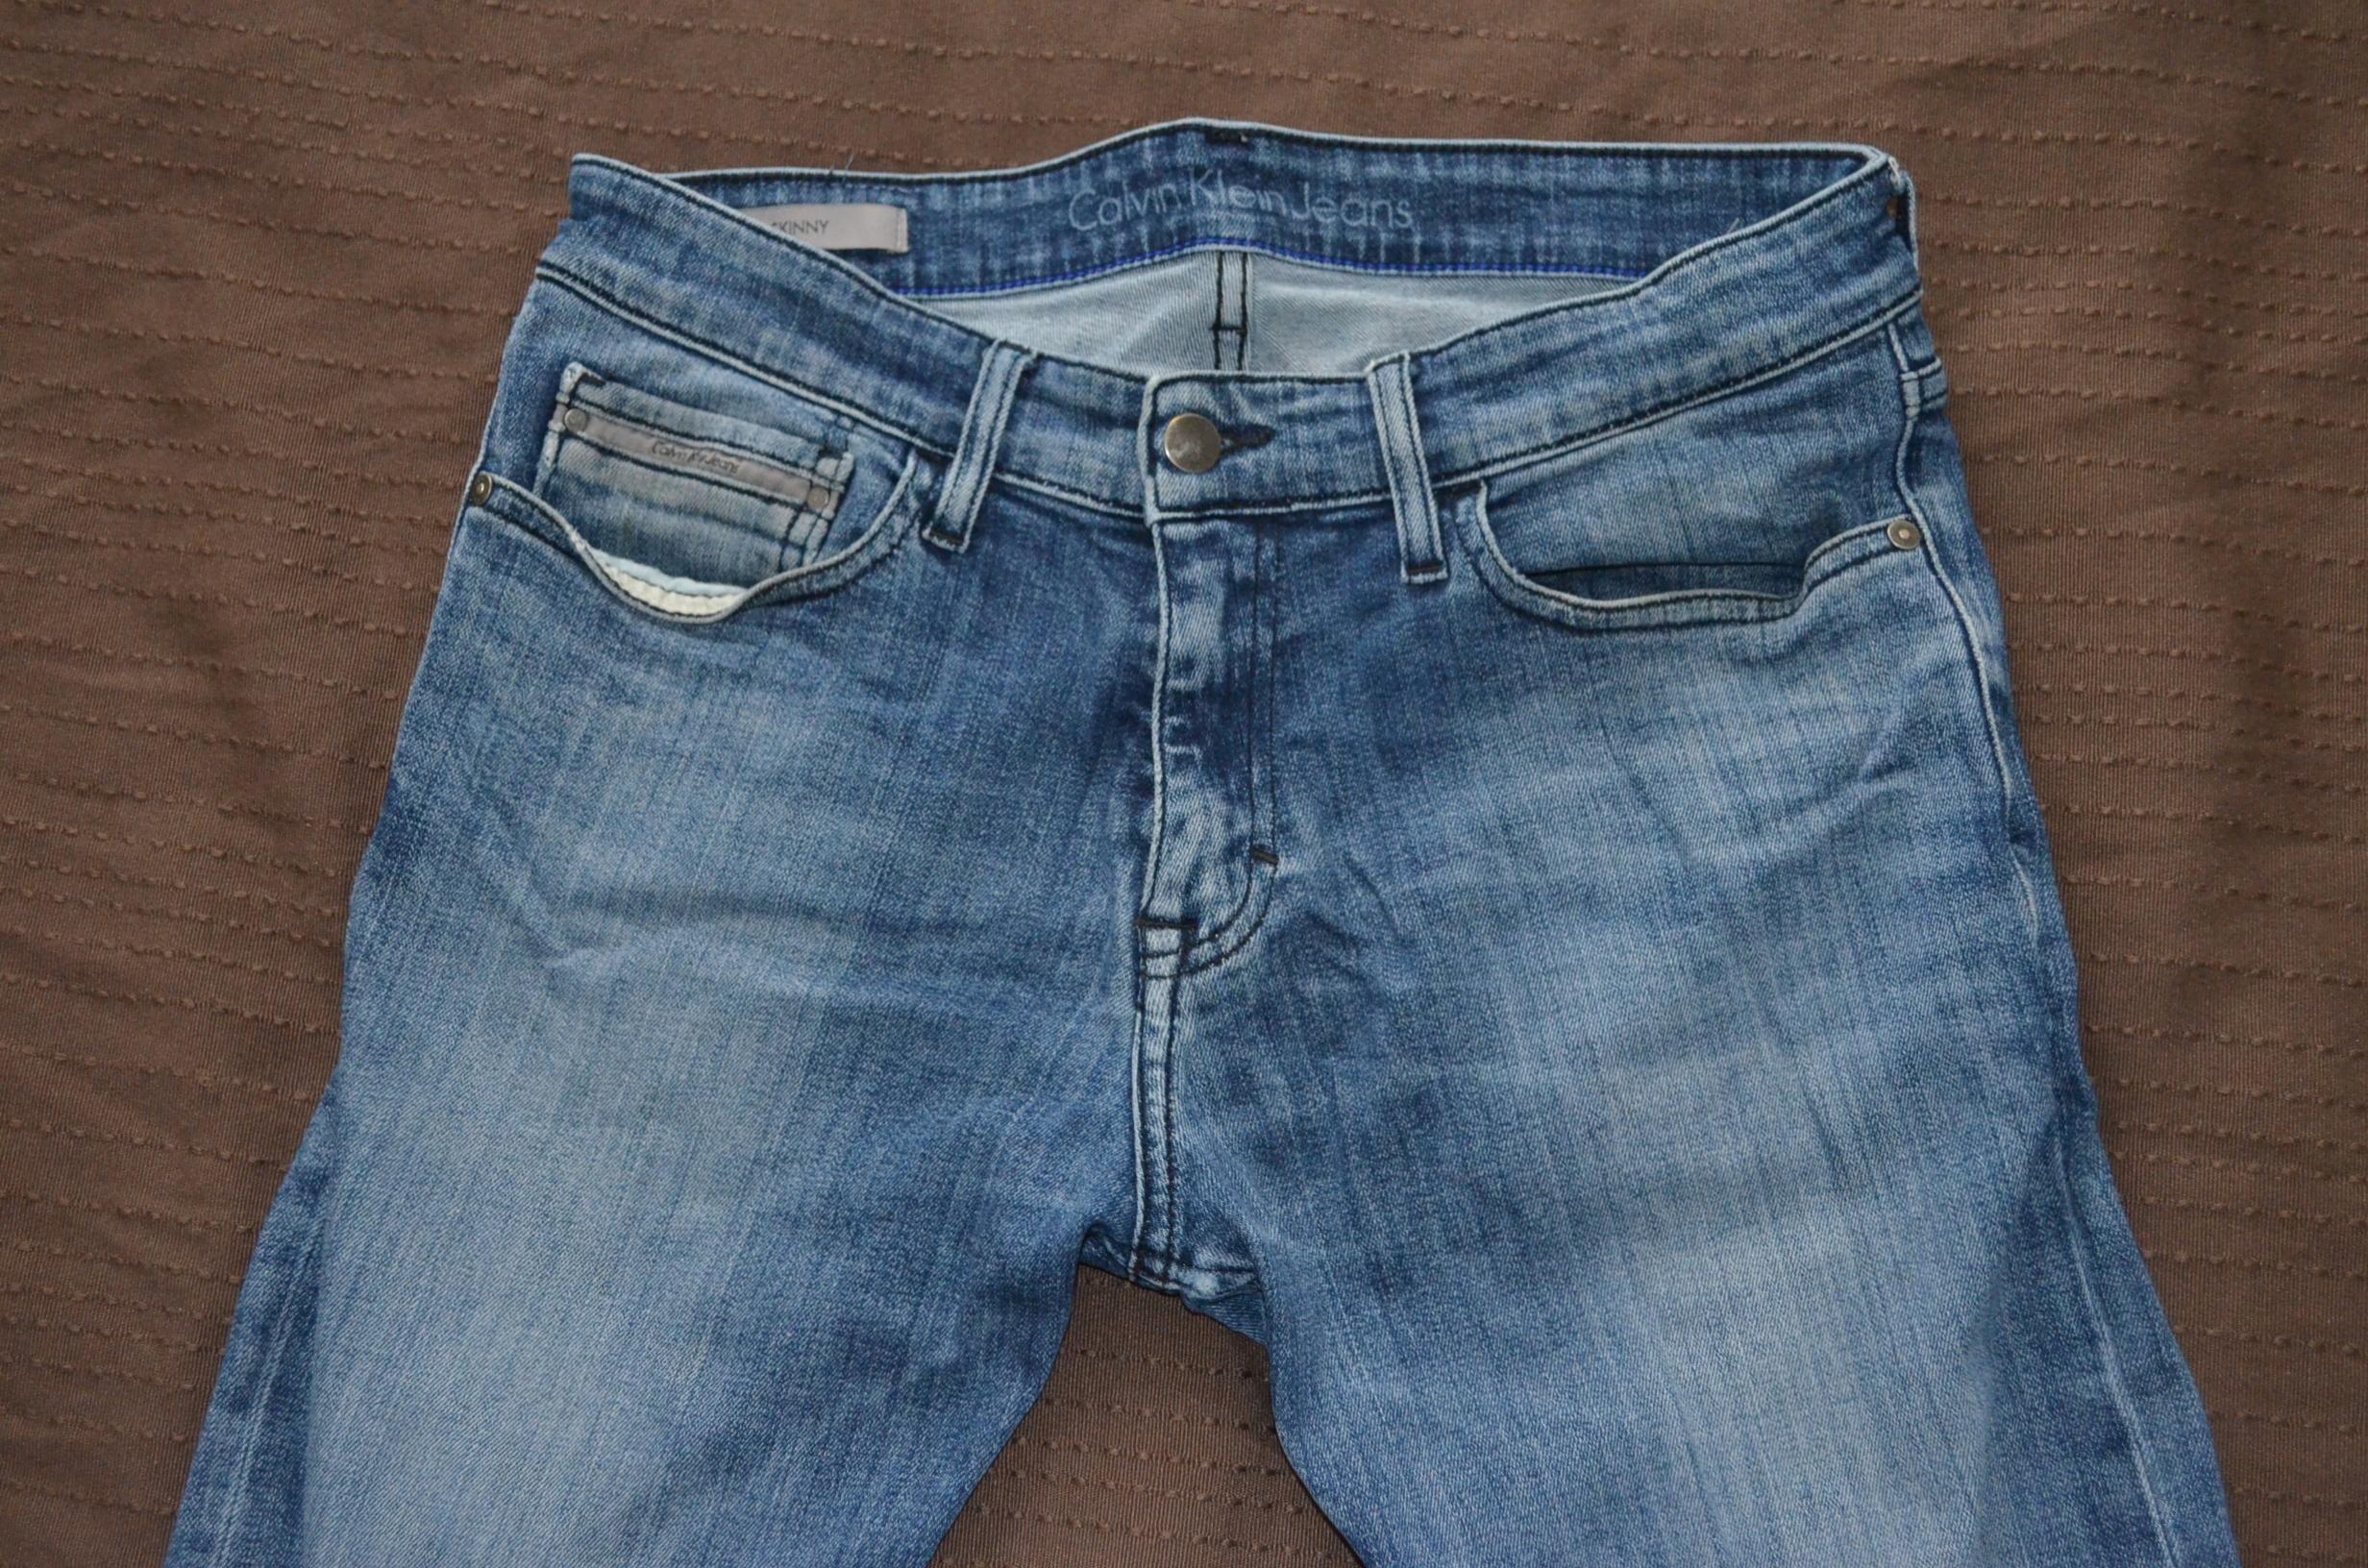 Spodnie męskie Calvin Clein W32/L34